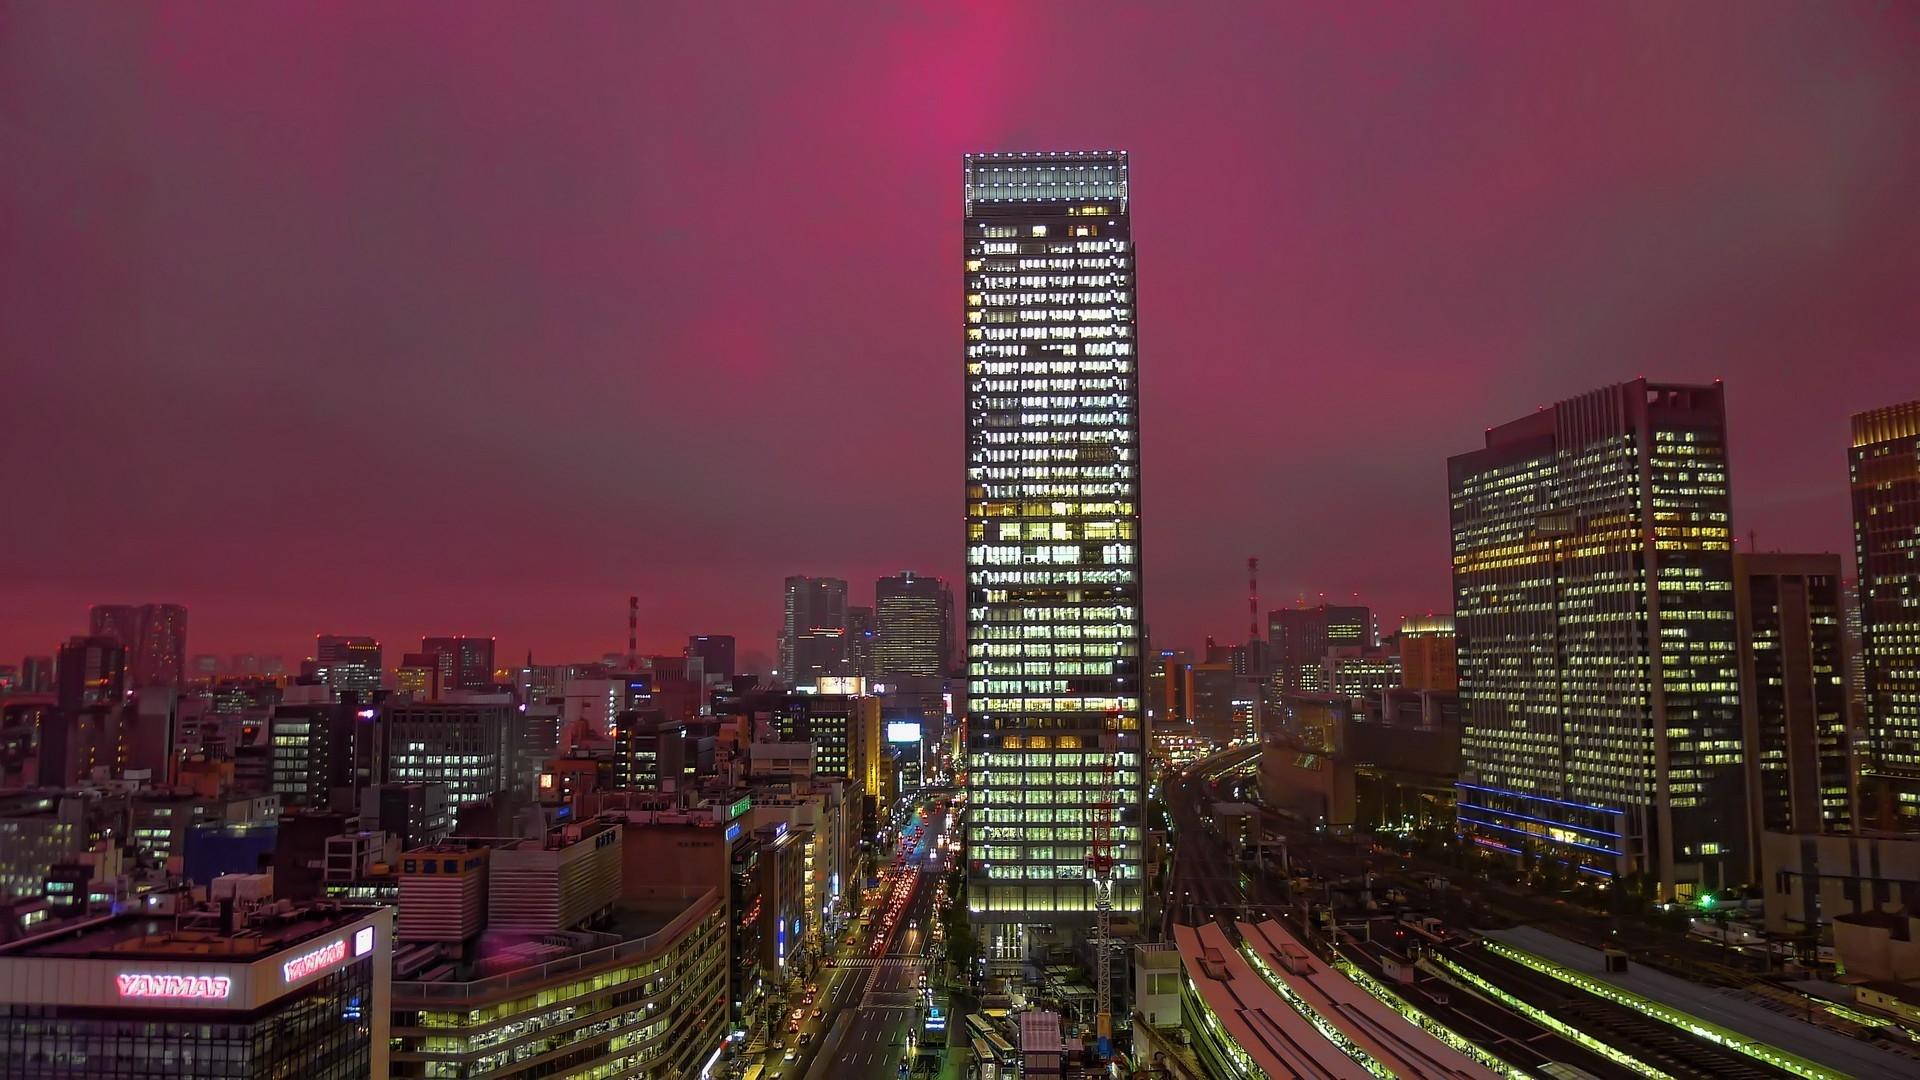 Japan City Cityscape Night Skyline Skyscraper Evening Tower Top View Horizon Dusk Metropolis Tokyo Downtown Landmark